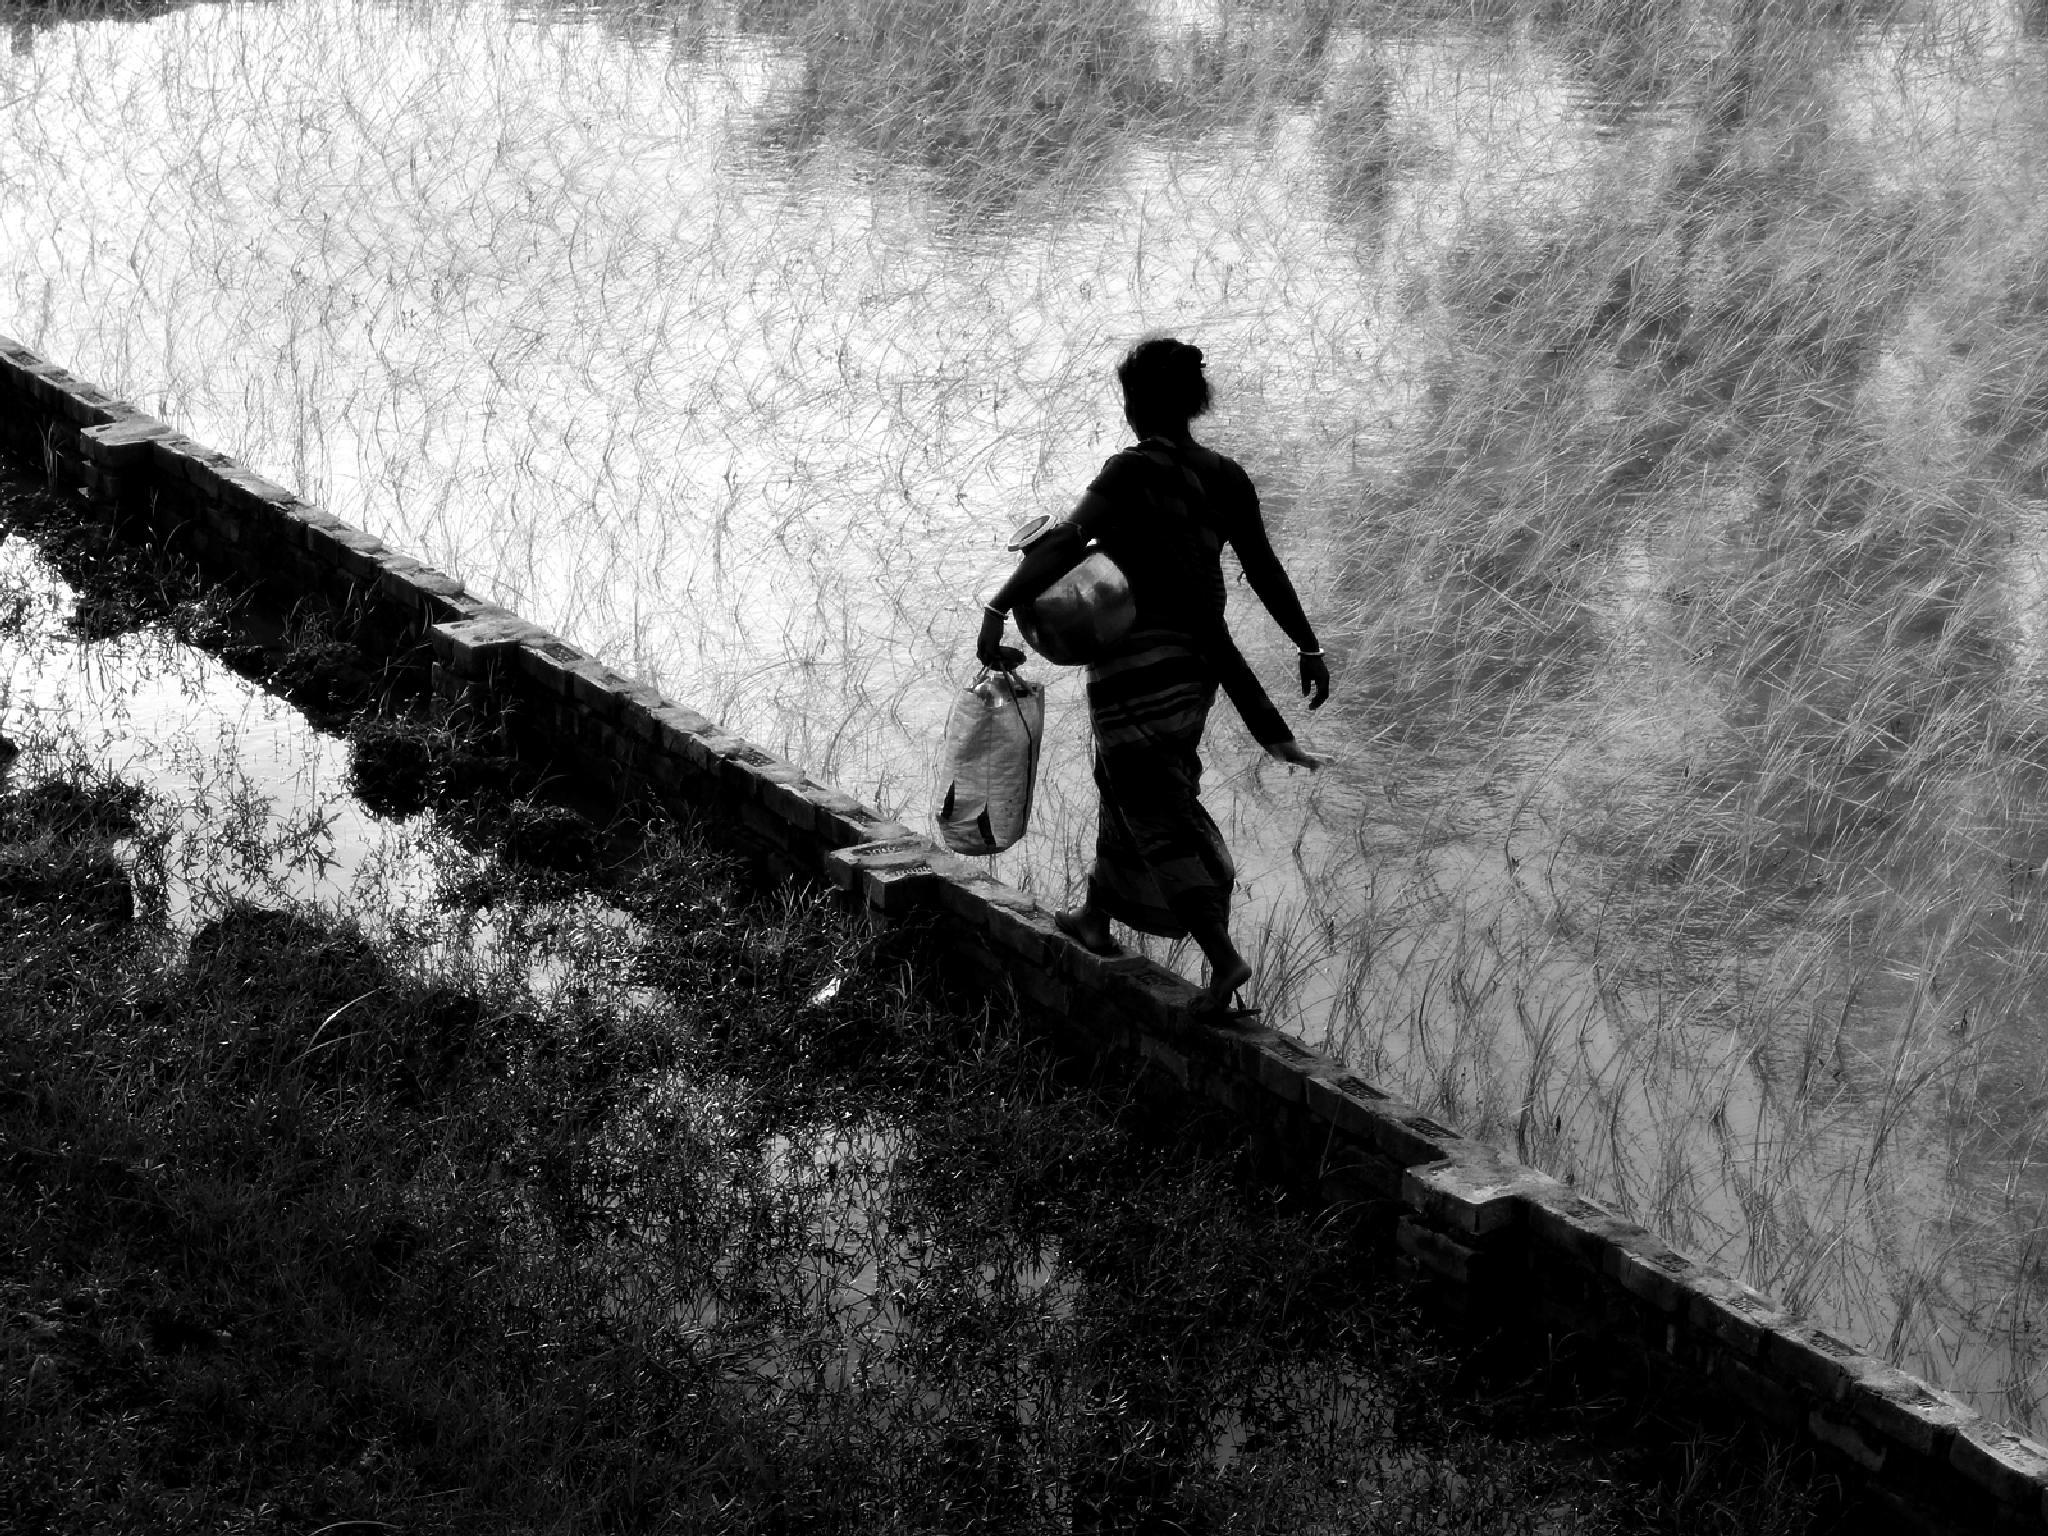 The Wowman by Subhayan Maji